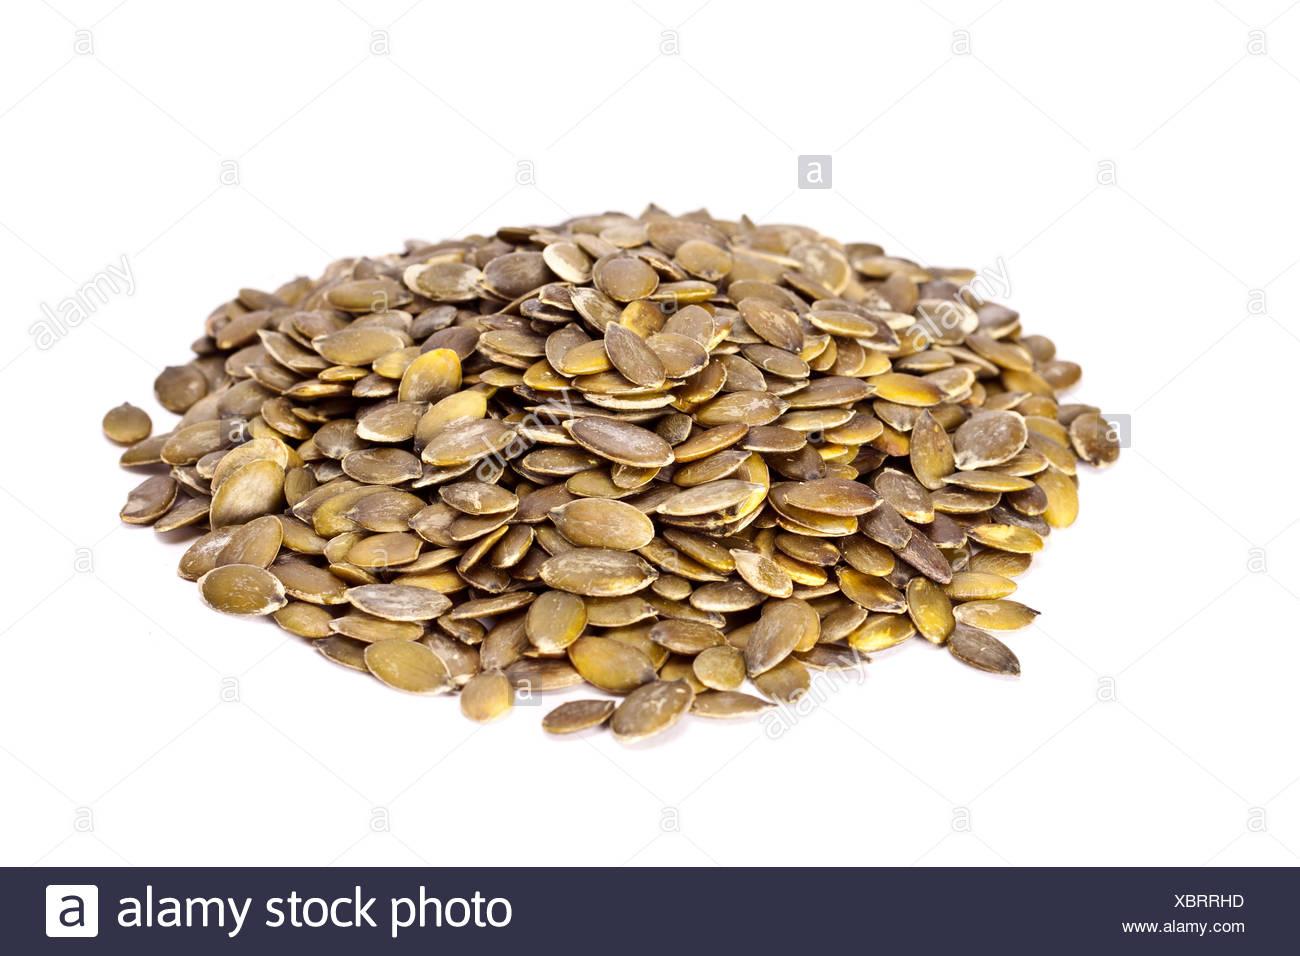 Dried pumpkin seeds. Stock Photo